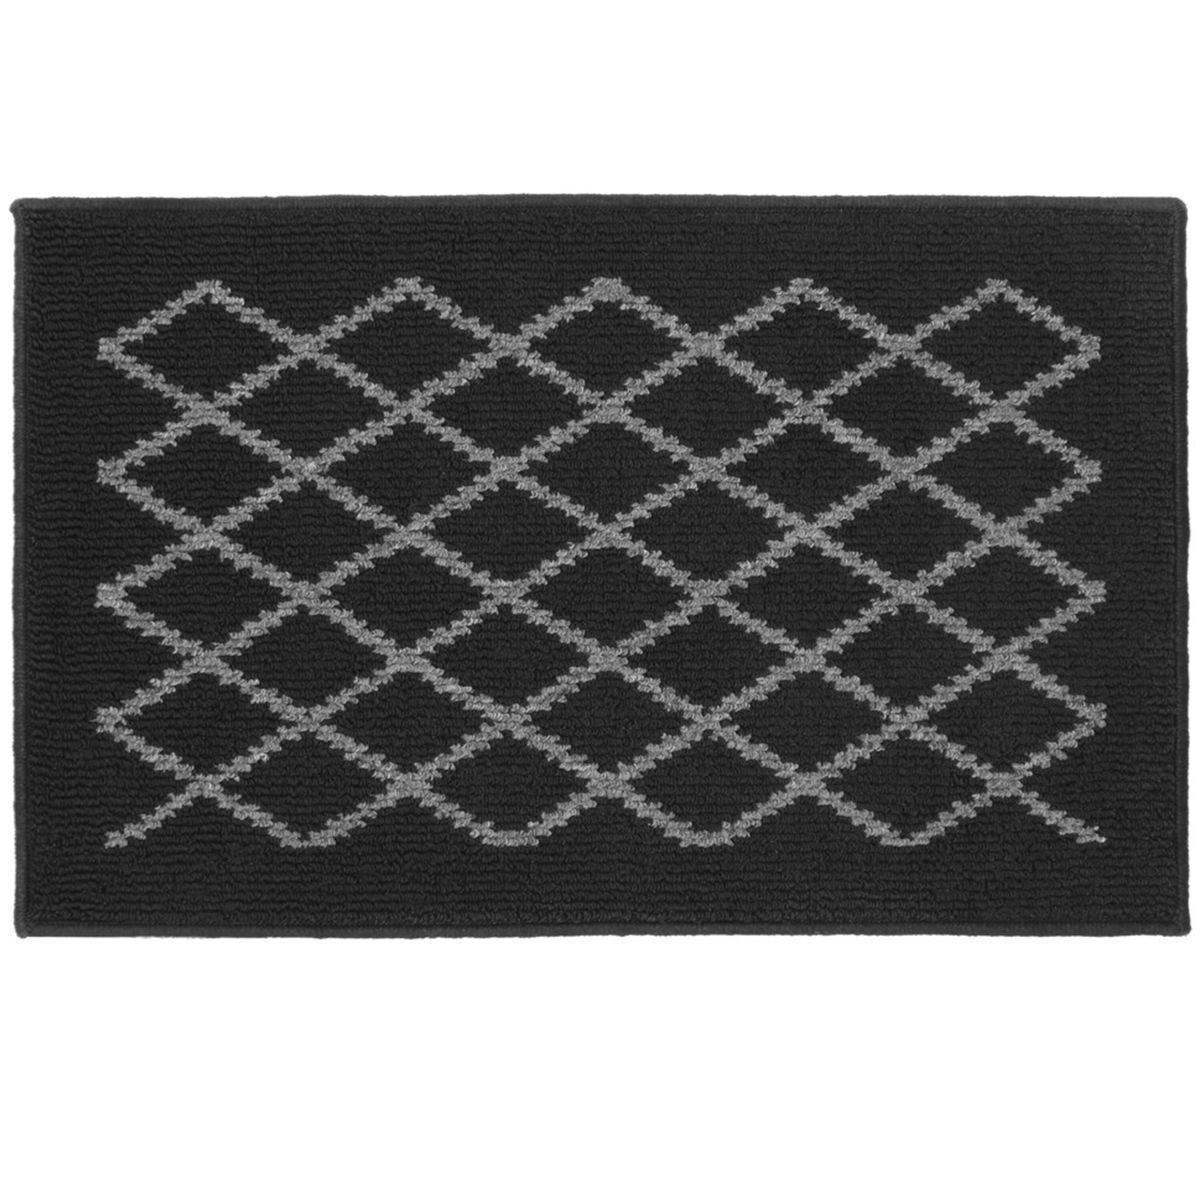 JVL 50x80cm Bergamo Doormat - Black/Grey